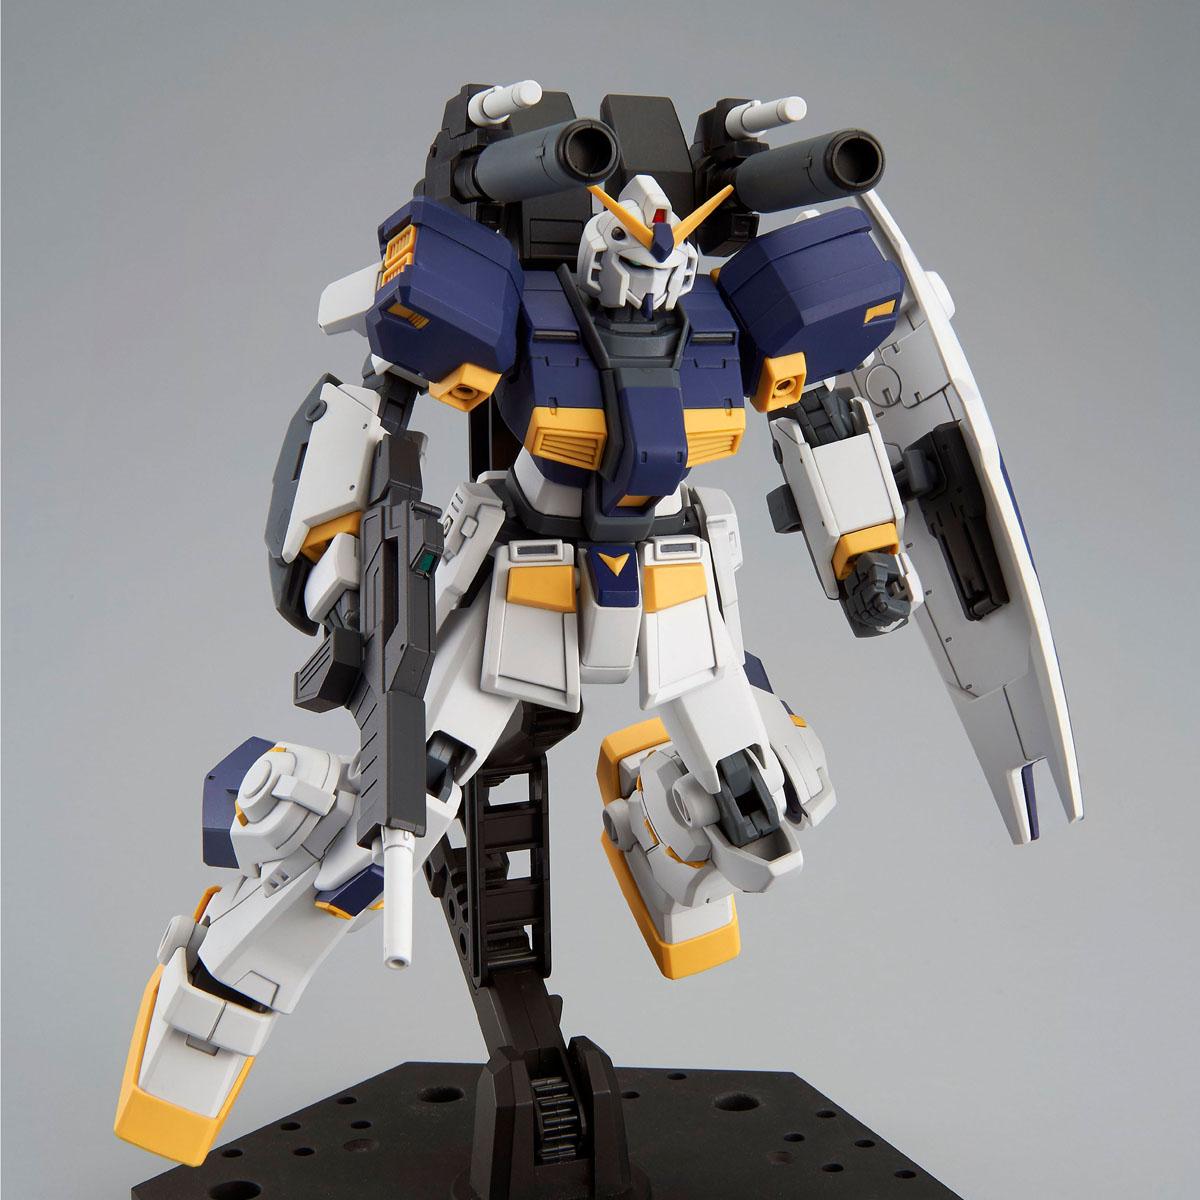 HG 1/144 GUNDAM G06 (MUDROCK) [Aug 2021 Delivery]